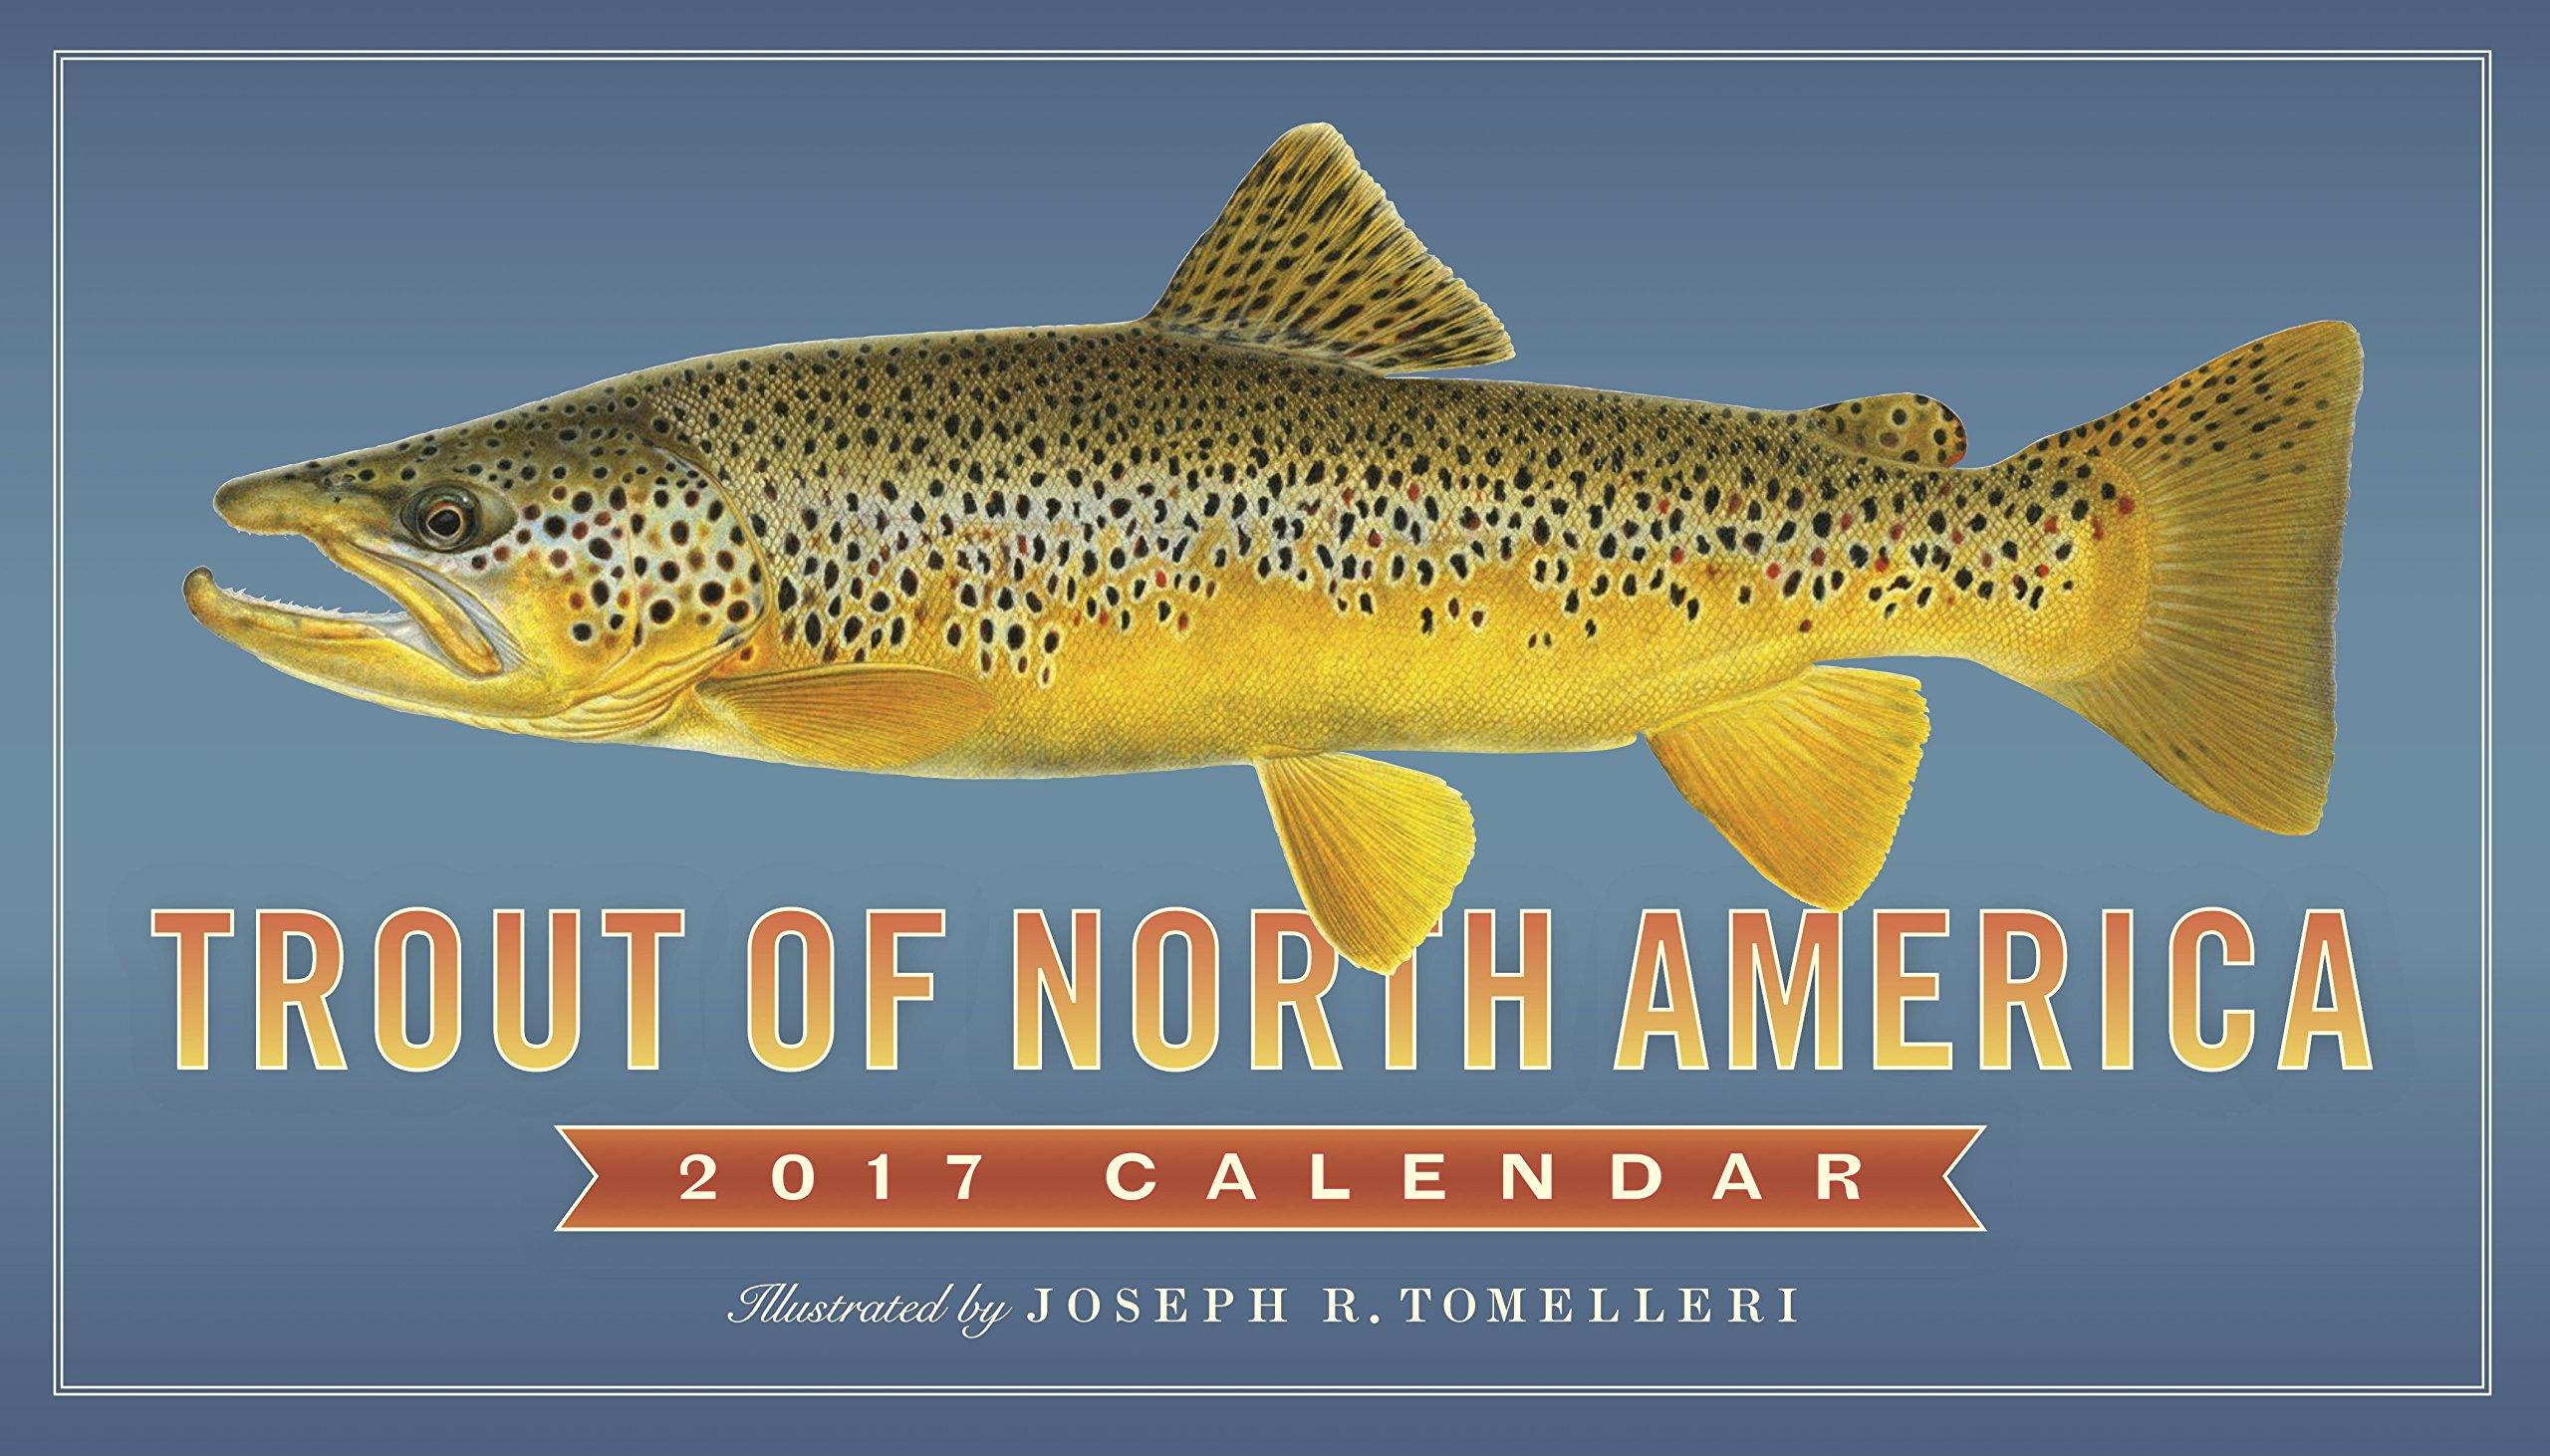 Trout Of North America Wall Calendar 2017 Workman Publishing Tomelleri Joseph R 9780761188490 Amazon Com Books